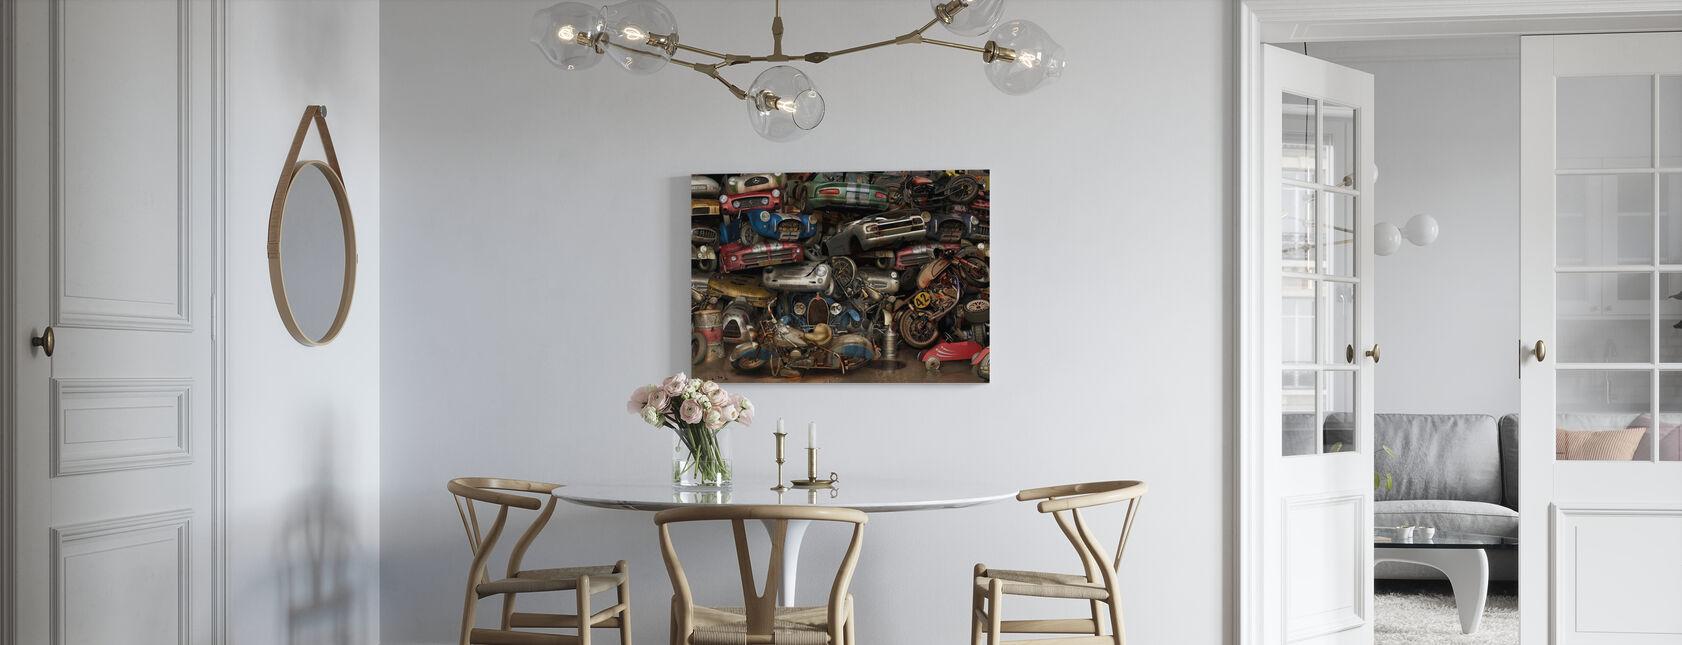 Recycling muur - Canvas print - Keuken